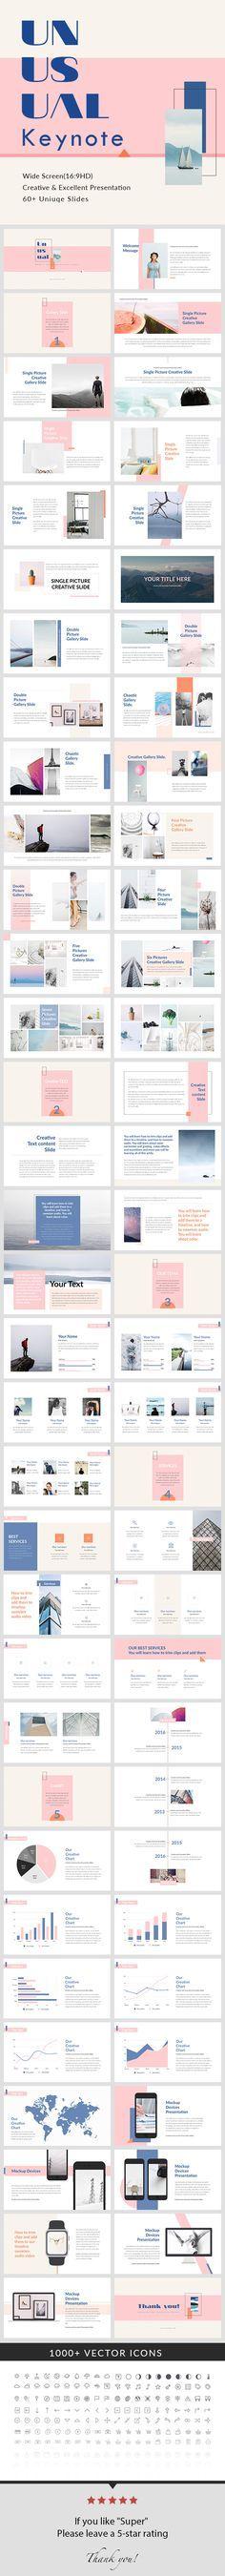 Unusual - Keynote Presentation Template - Creative Keynote Templates